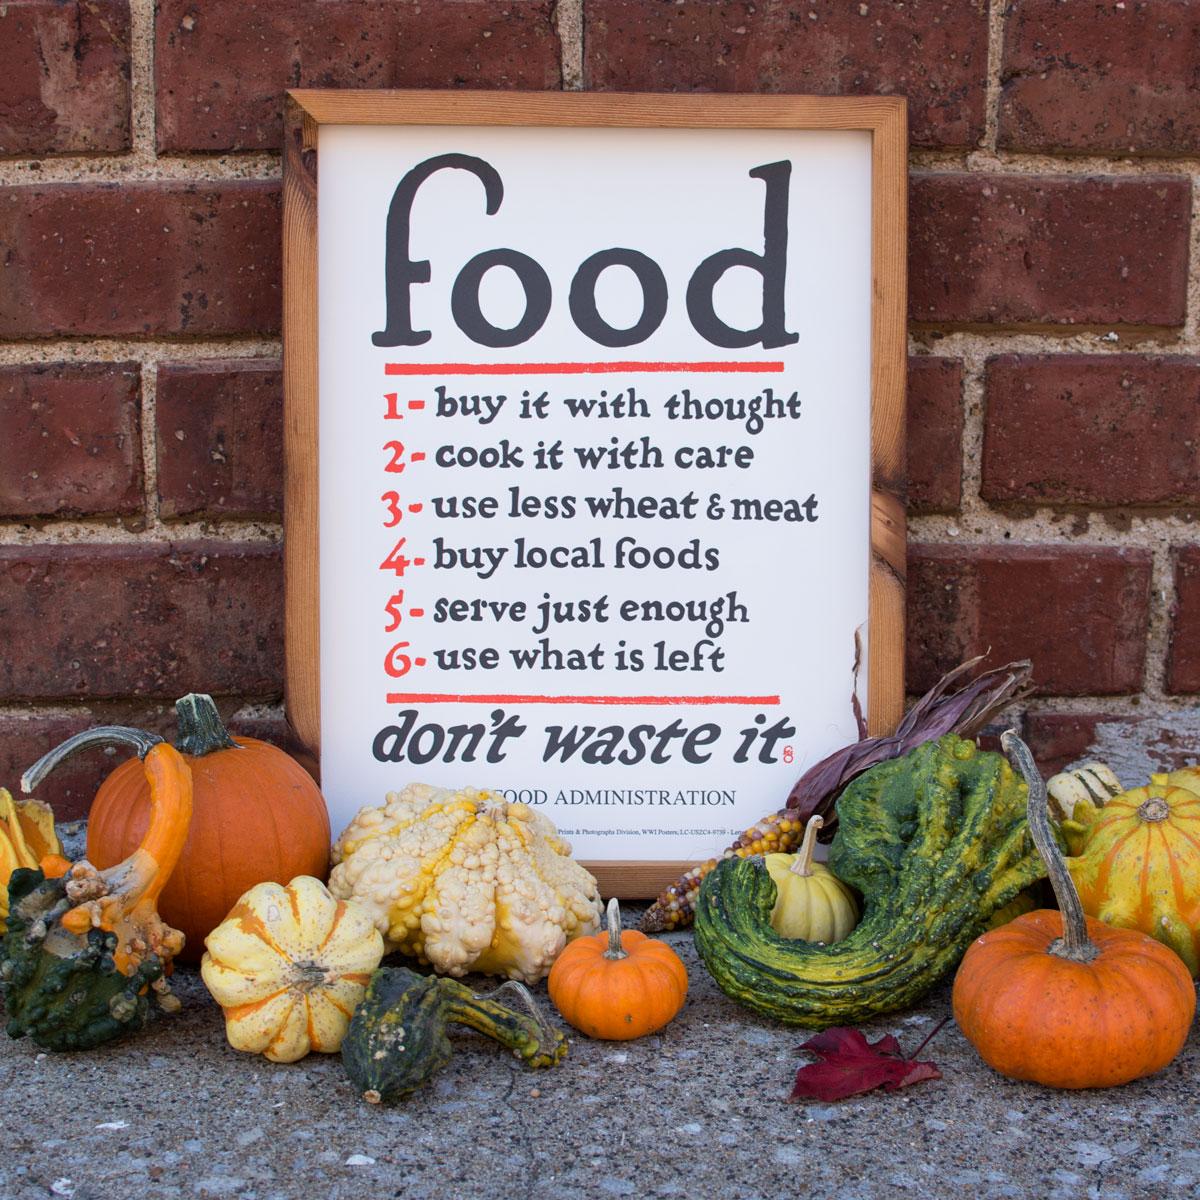 lg-food-rules-brick-wall-straight-square-1200px.jpg